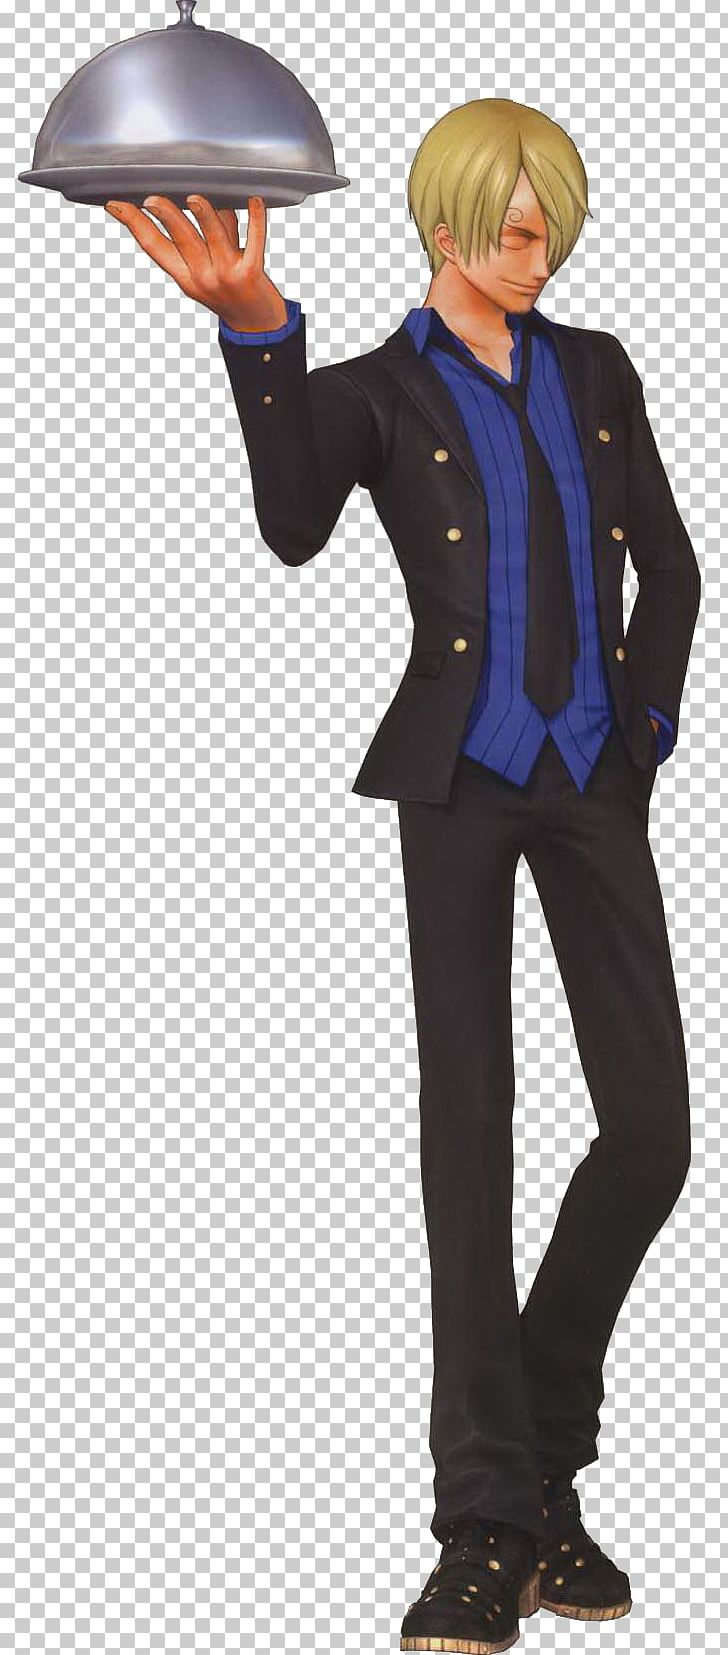 One Piece: Pirate Warriors 3 Vinsmoke Sanji Usopp Roronoa Zoro PNG, Clipart, Art, Cartoon, Costume, Deviantart, Digital Art Free PNG Download